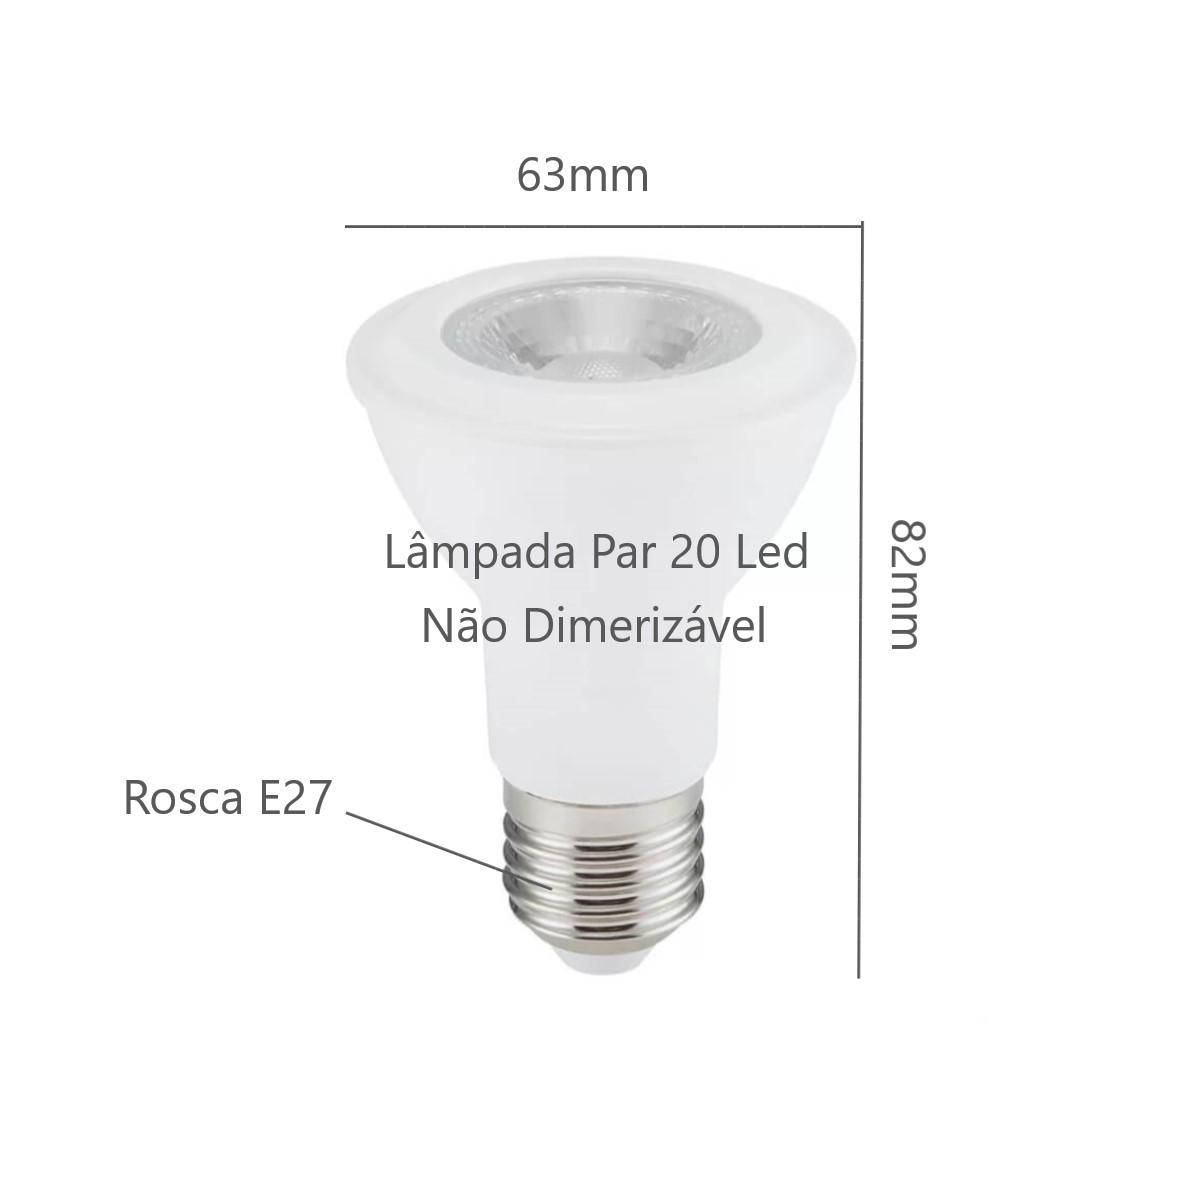 Kit Trilho Eletrificado 1,5m Branco Oko Nordecor + 4 Spot Par20 + Lâmp. Led Luz Quente